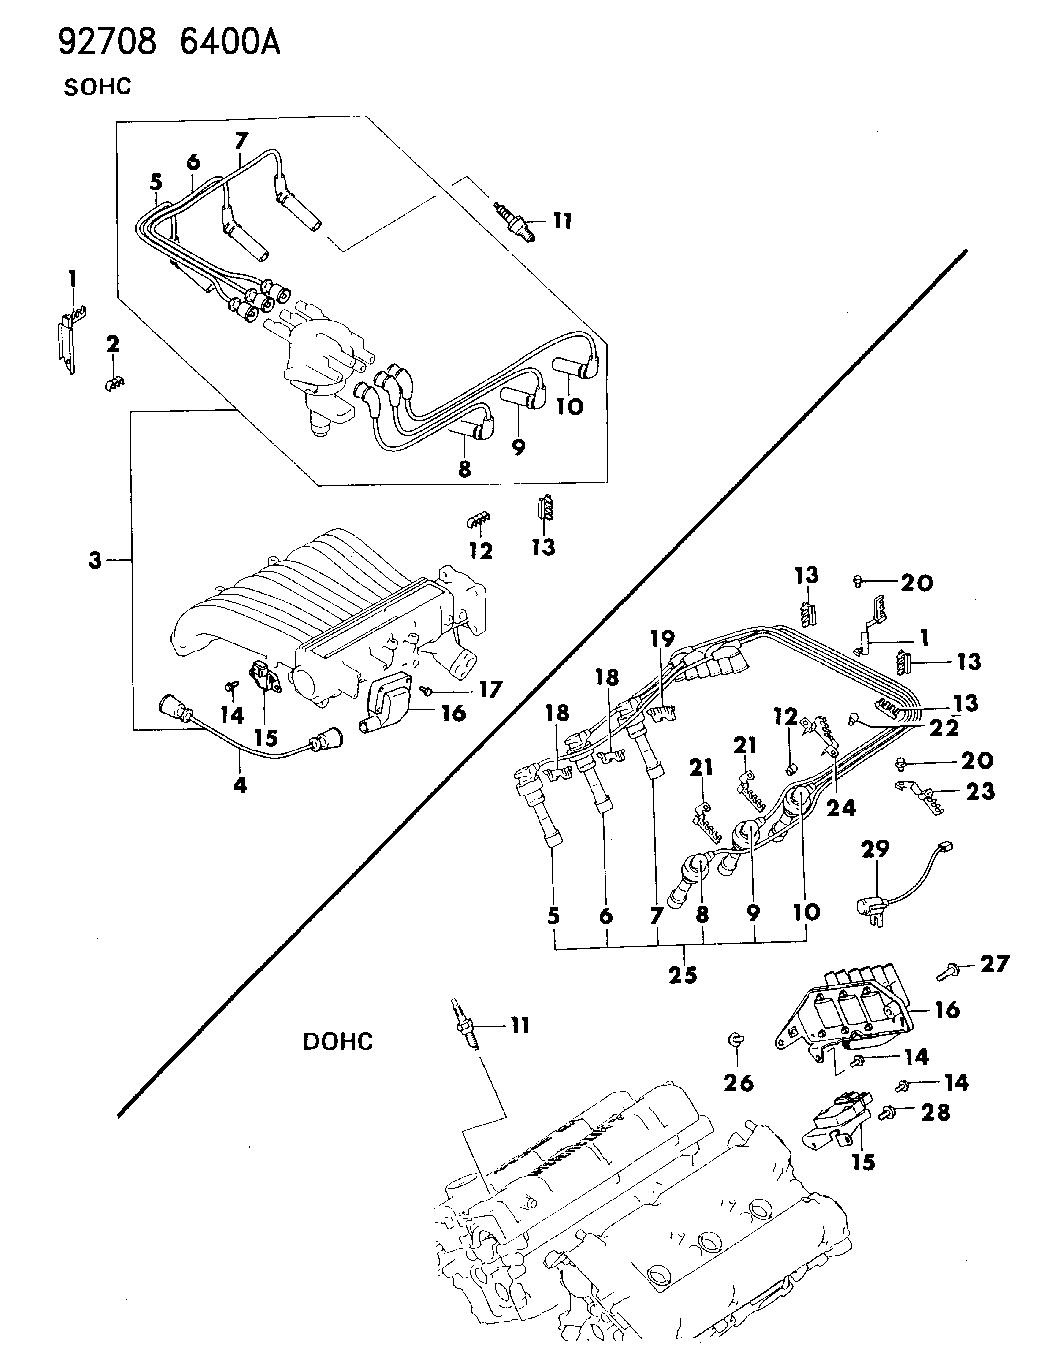 Mb543146